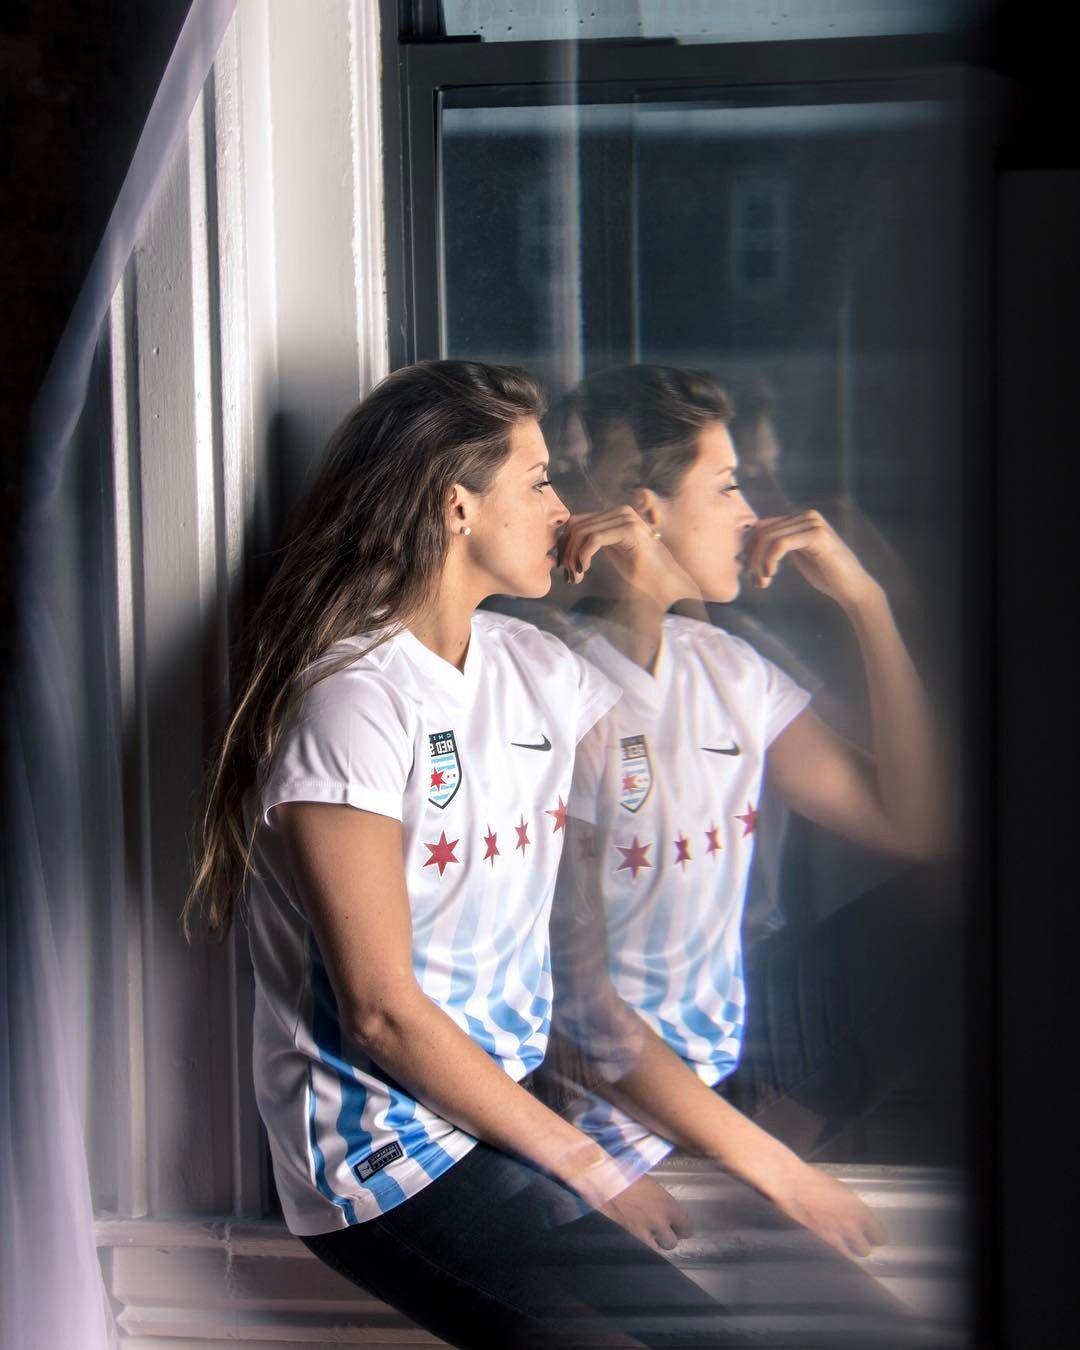 Pin by Jennifer Whelan on Sports Us soccer, Soccer players